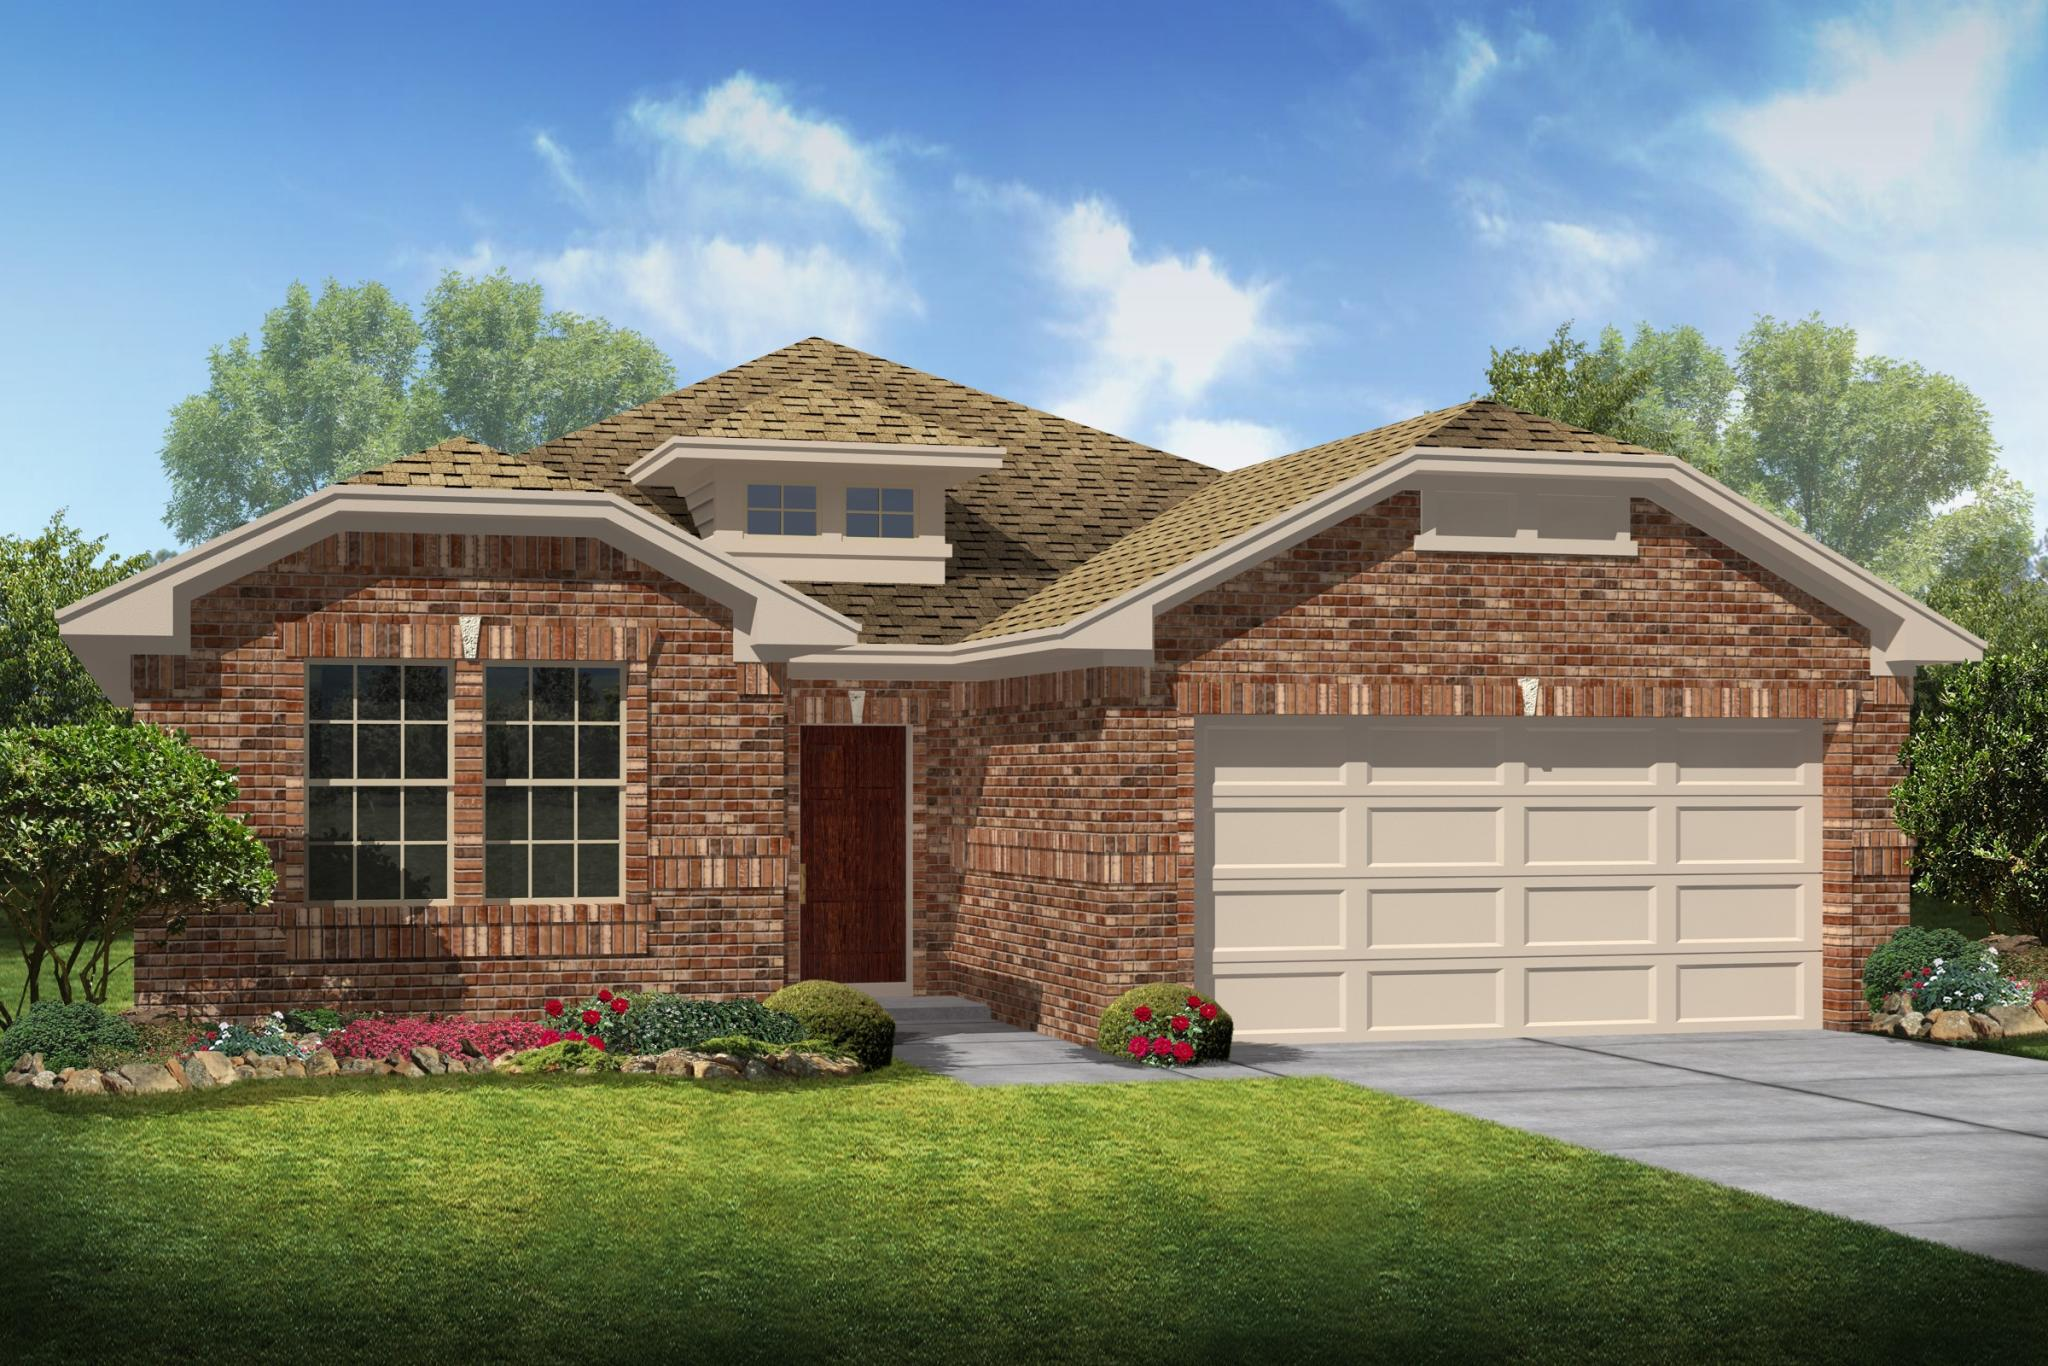 514 American Black Bear Drive Homesite #8, Crosby, TX 77532 | Trulia